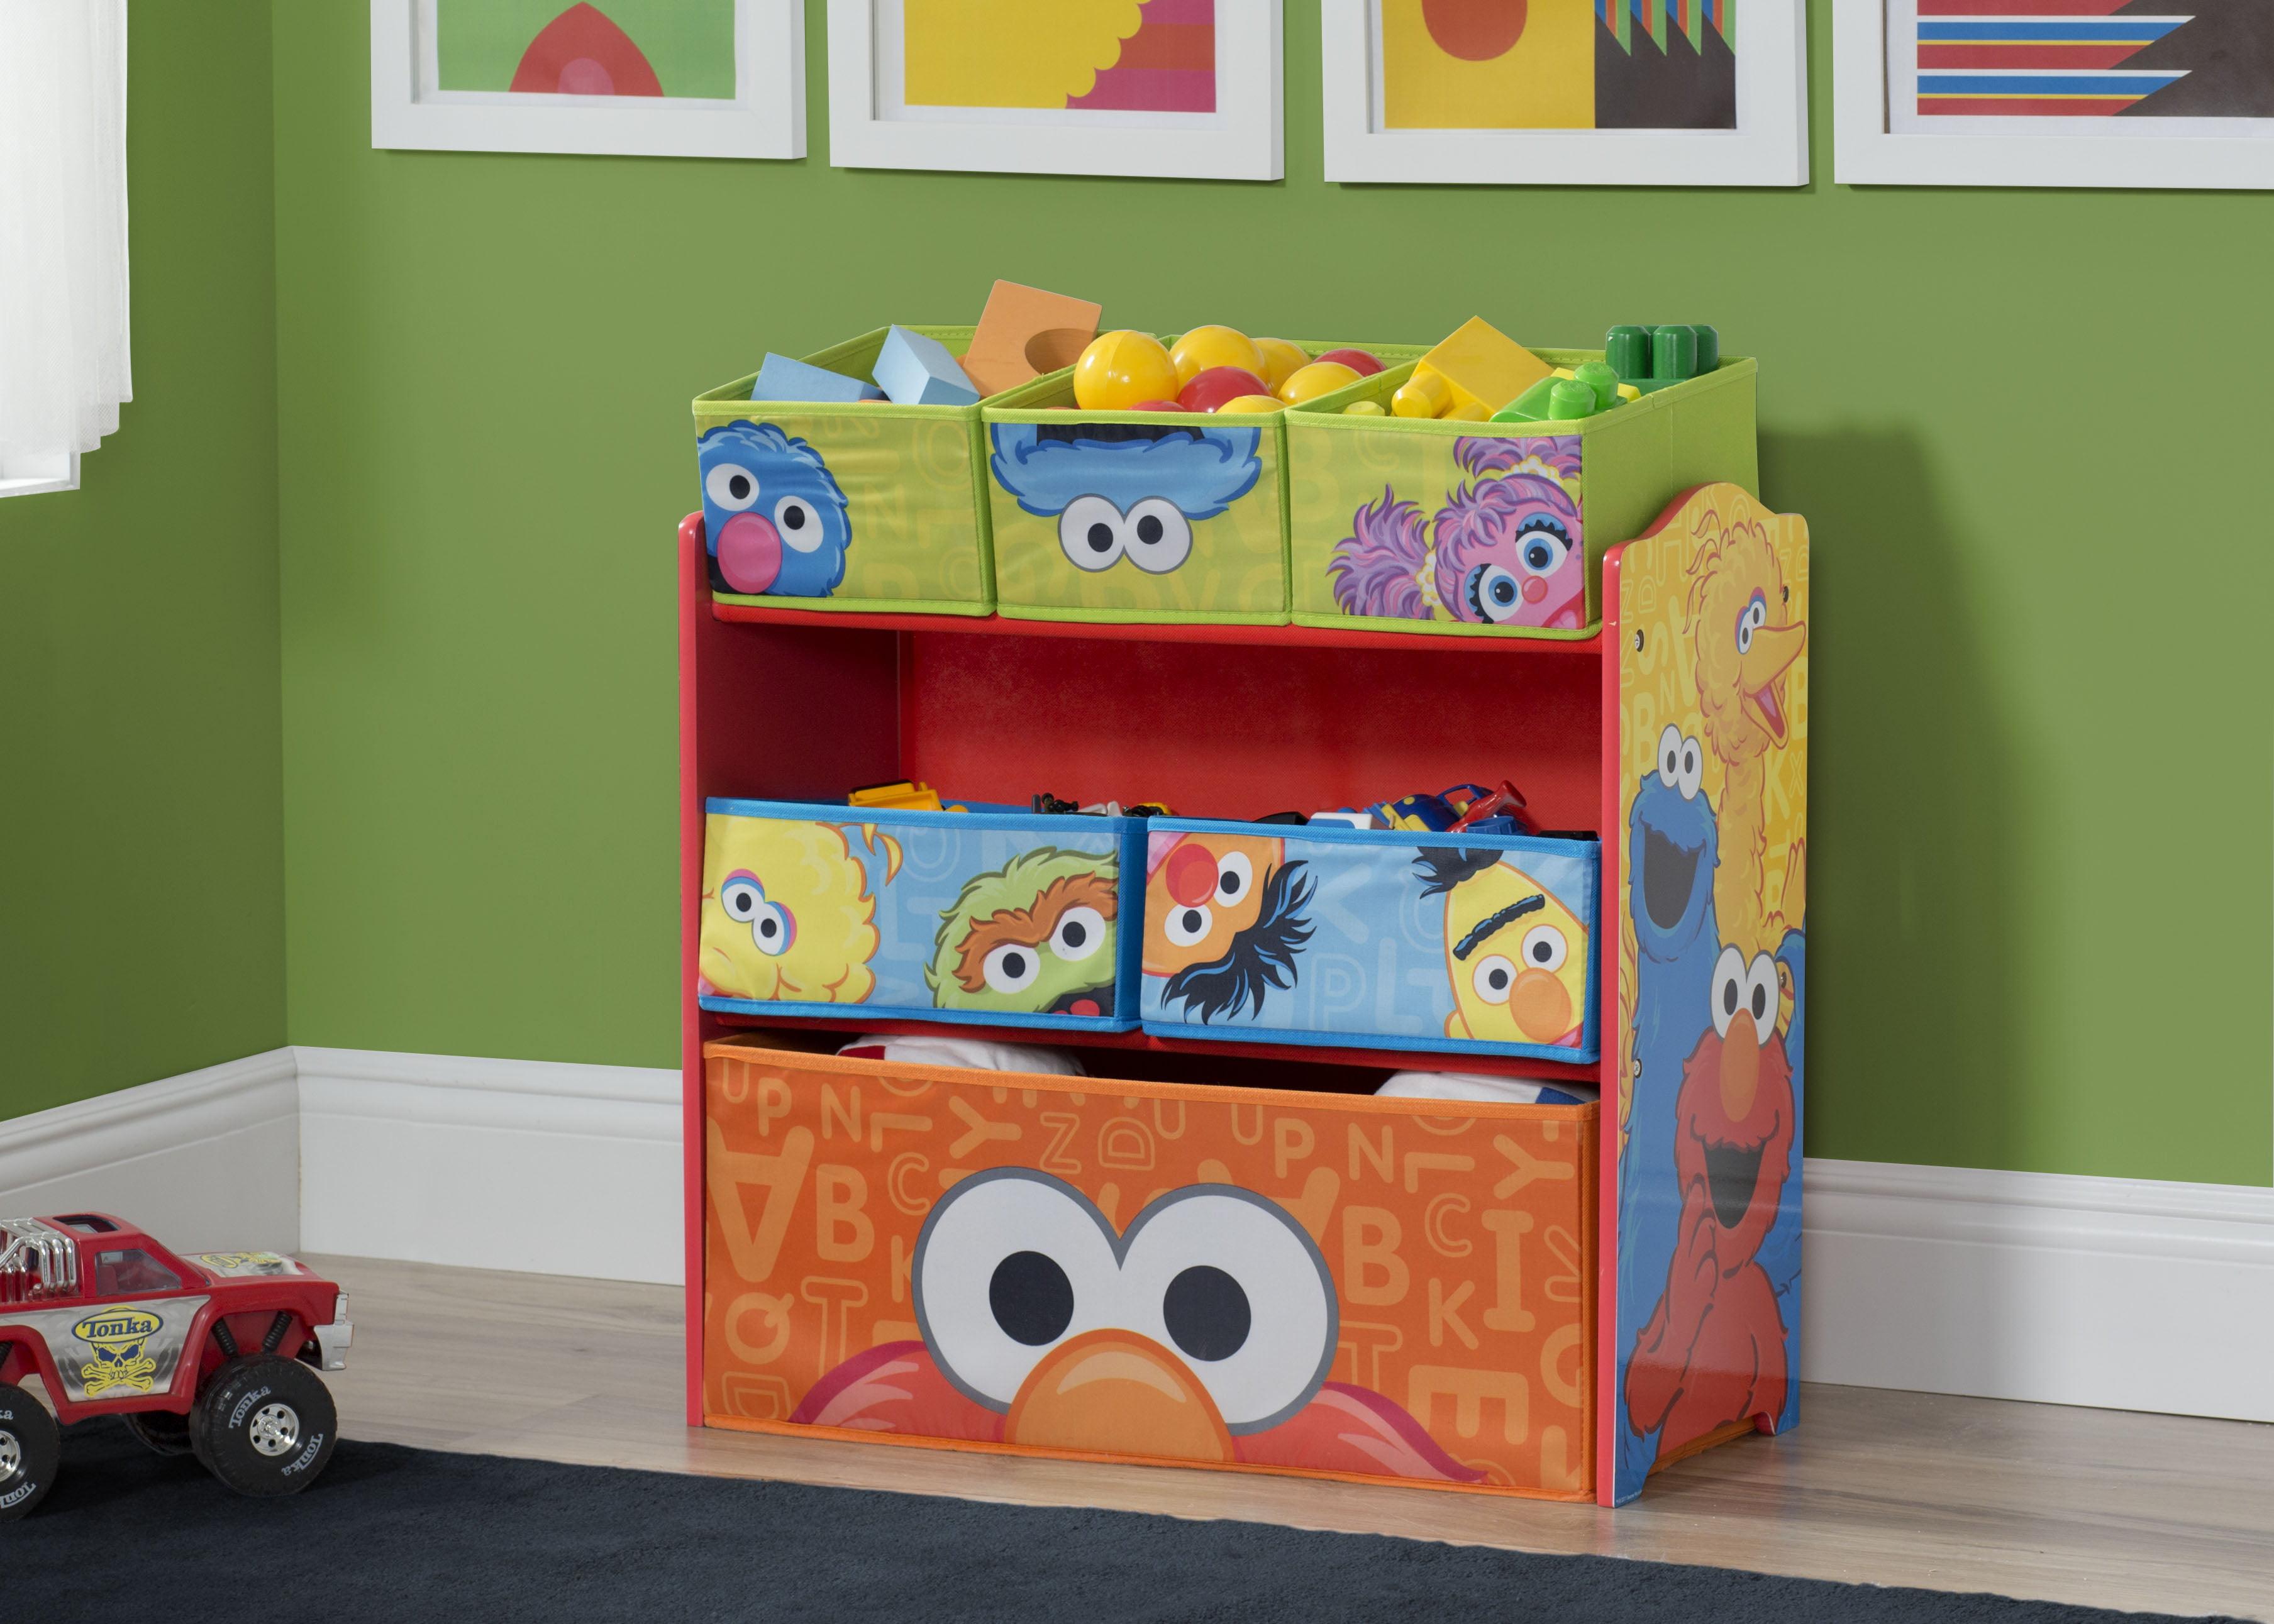 Sesame Street Toy Organizer 9 Bins Bedroom Basement Fun Room Furniture Elmo